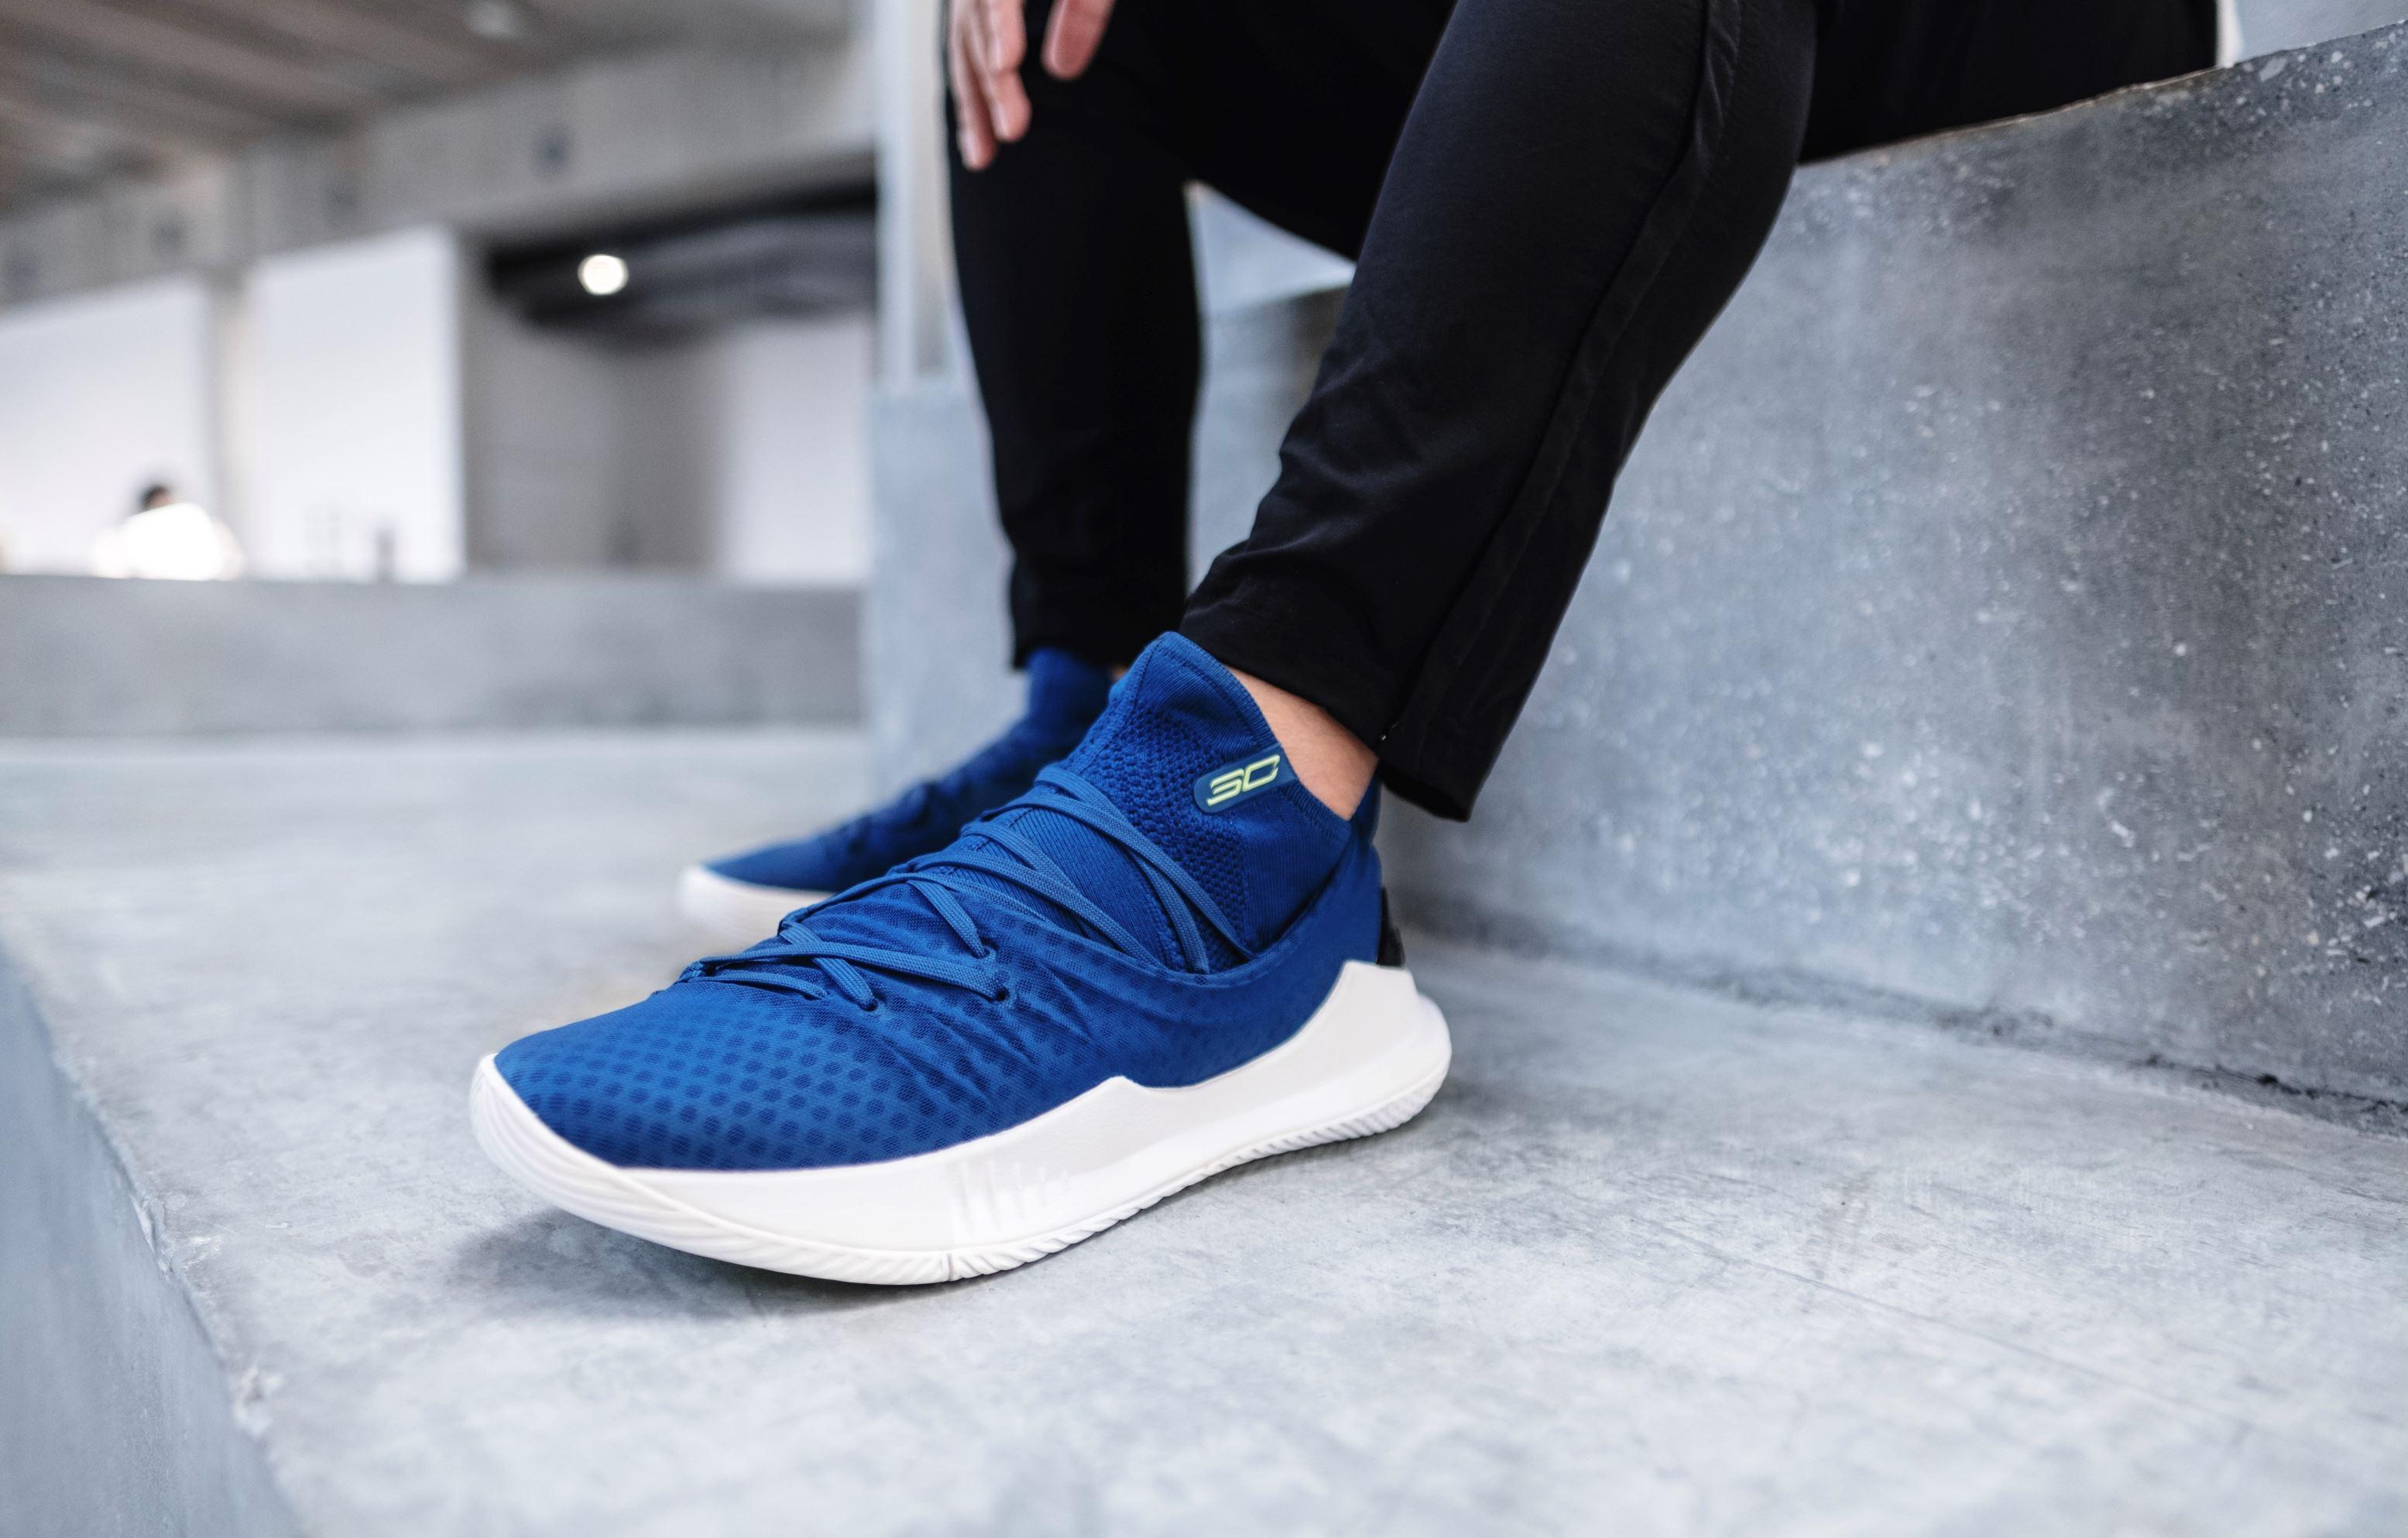 online retailer 7d195 4b1a9 The UA Curry 5 'Moroccan Blue' Flaunts the Warriors' Blue ...